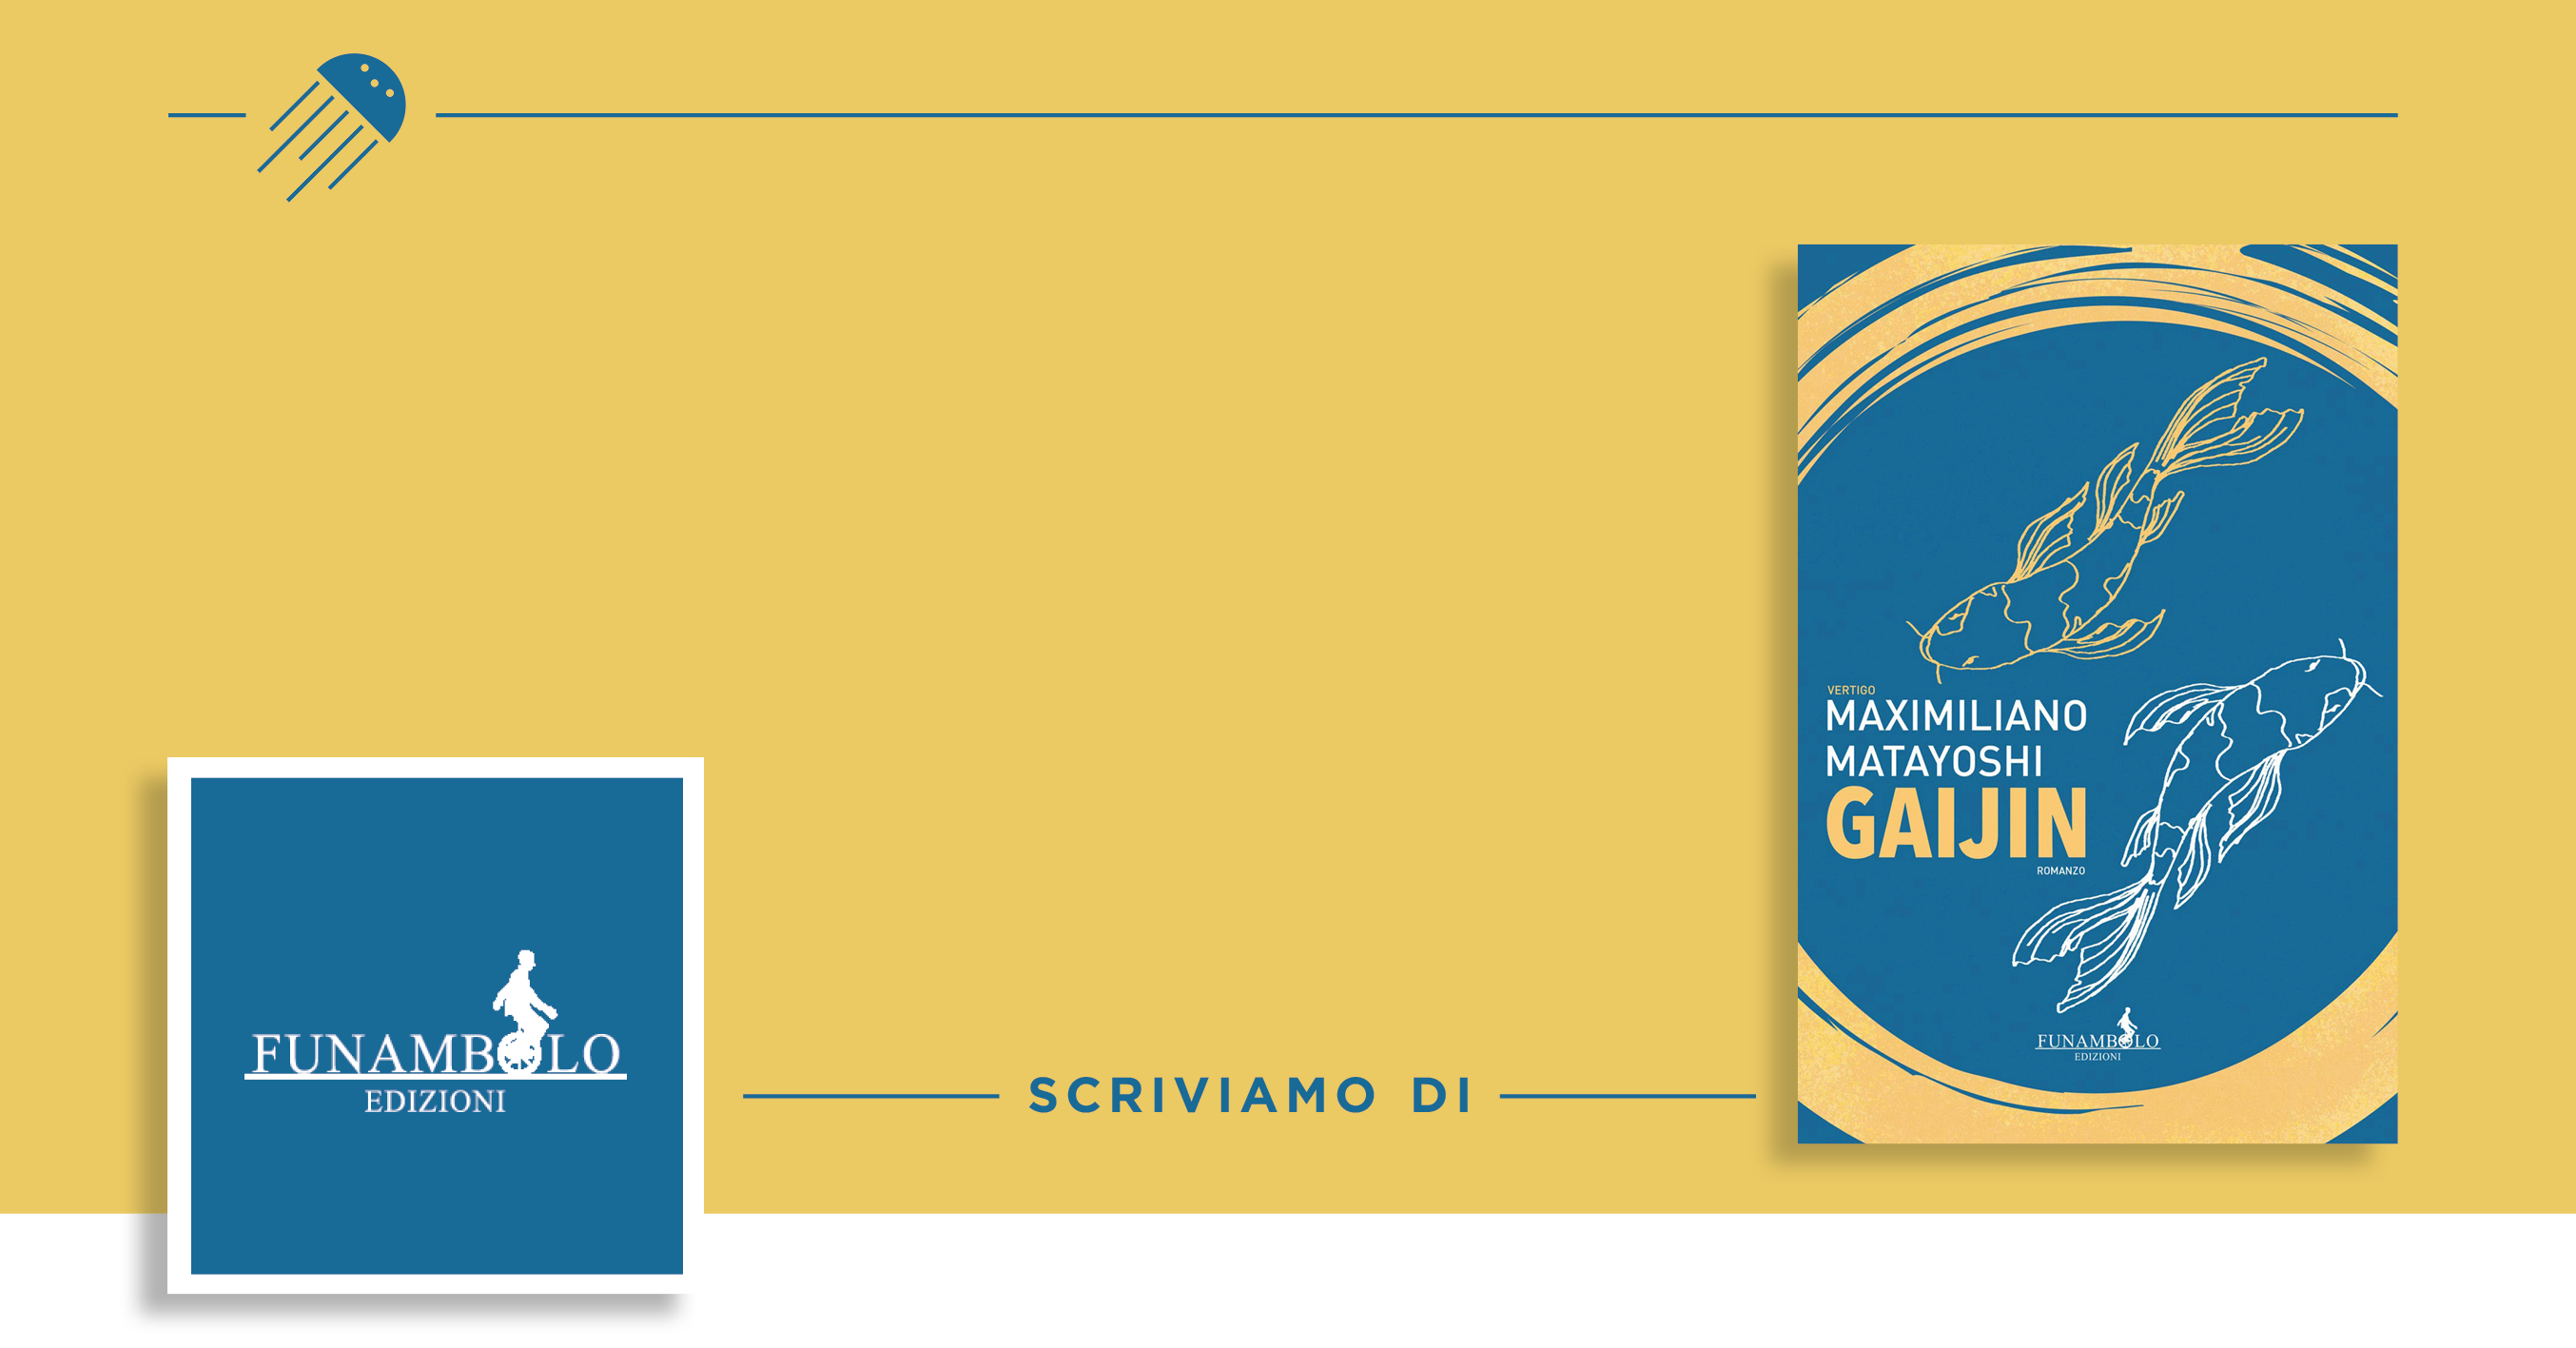 Gaijin di Maximiliano Matayoshi